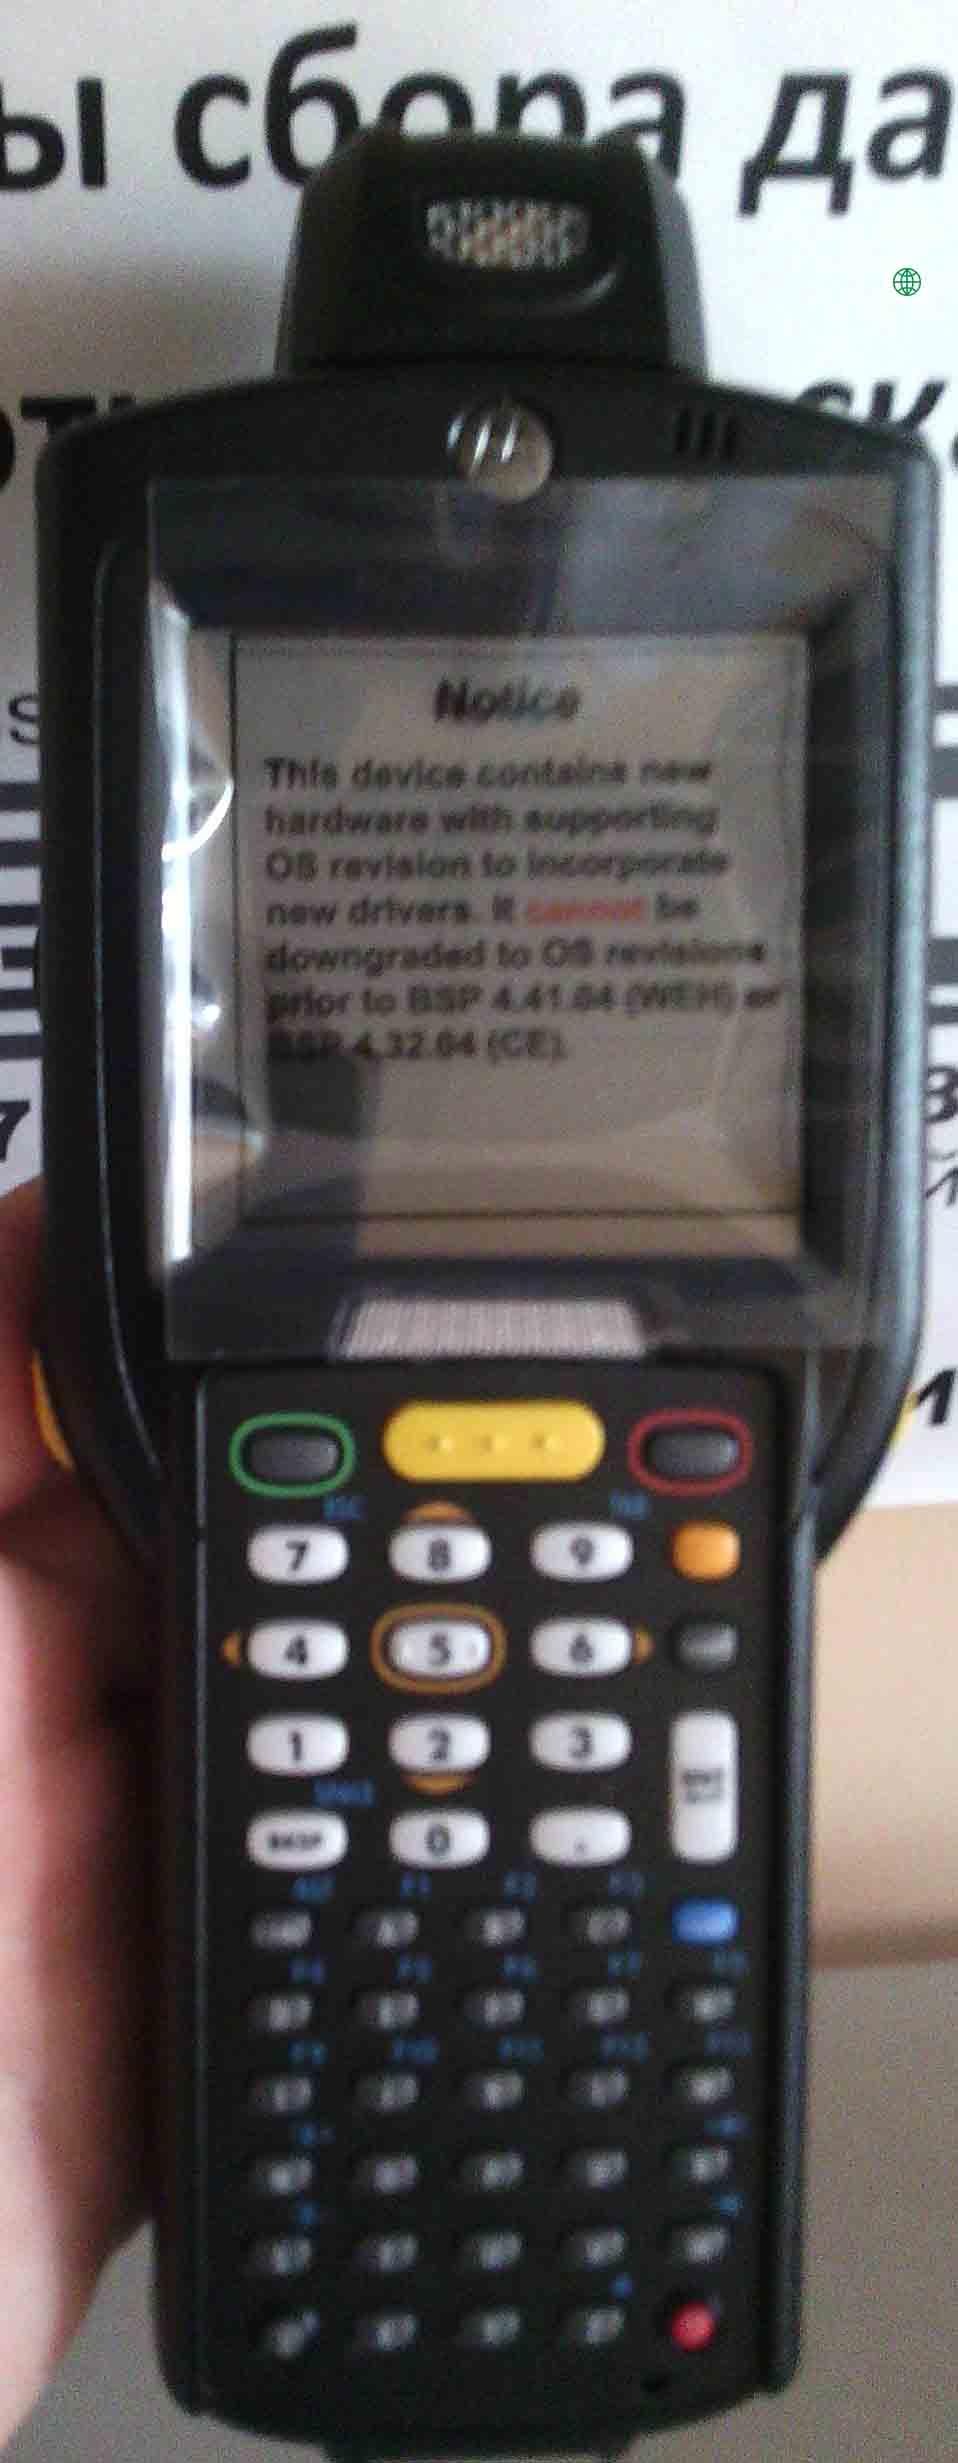 MC3190 RL4S04E0A Терминал сбора данных